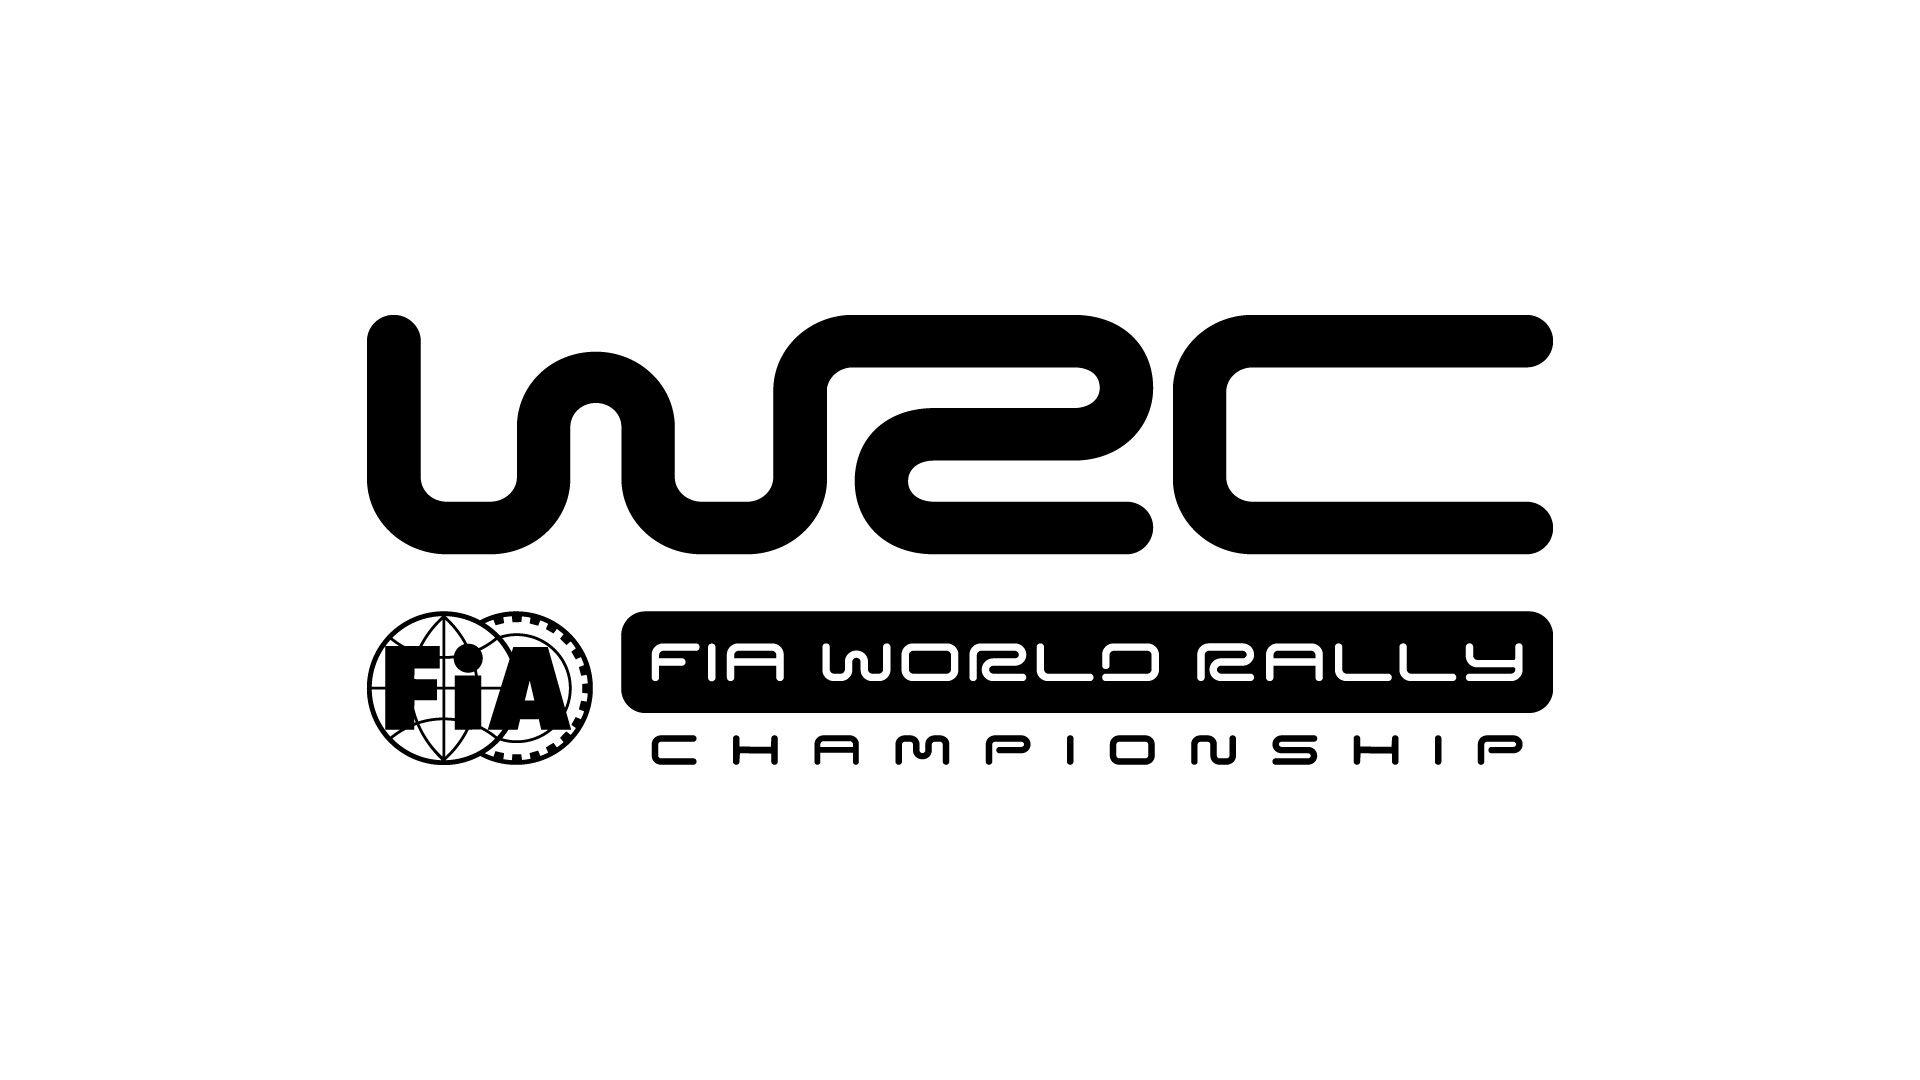 www.wrc.com